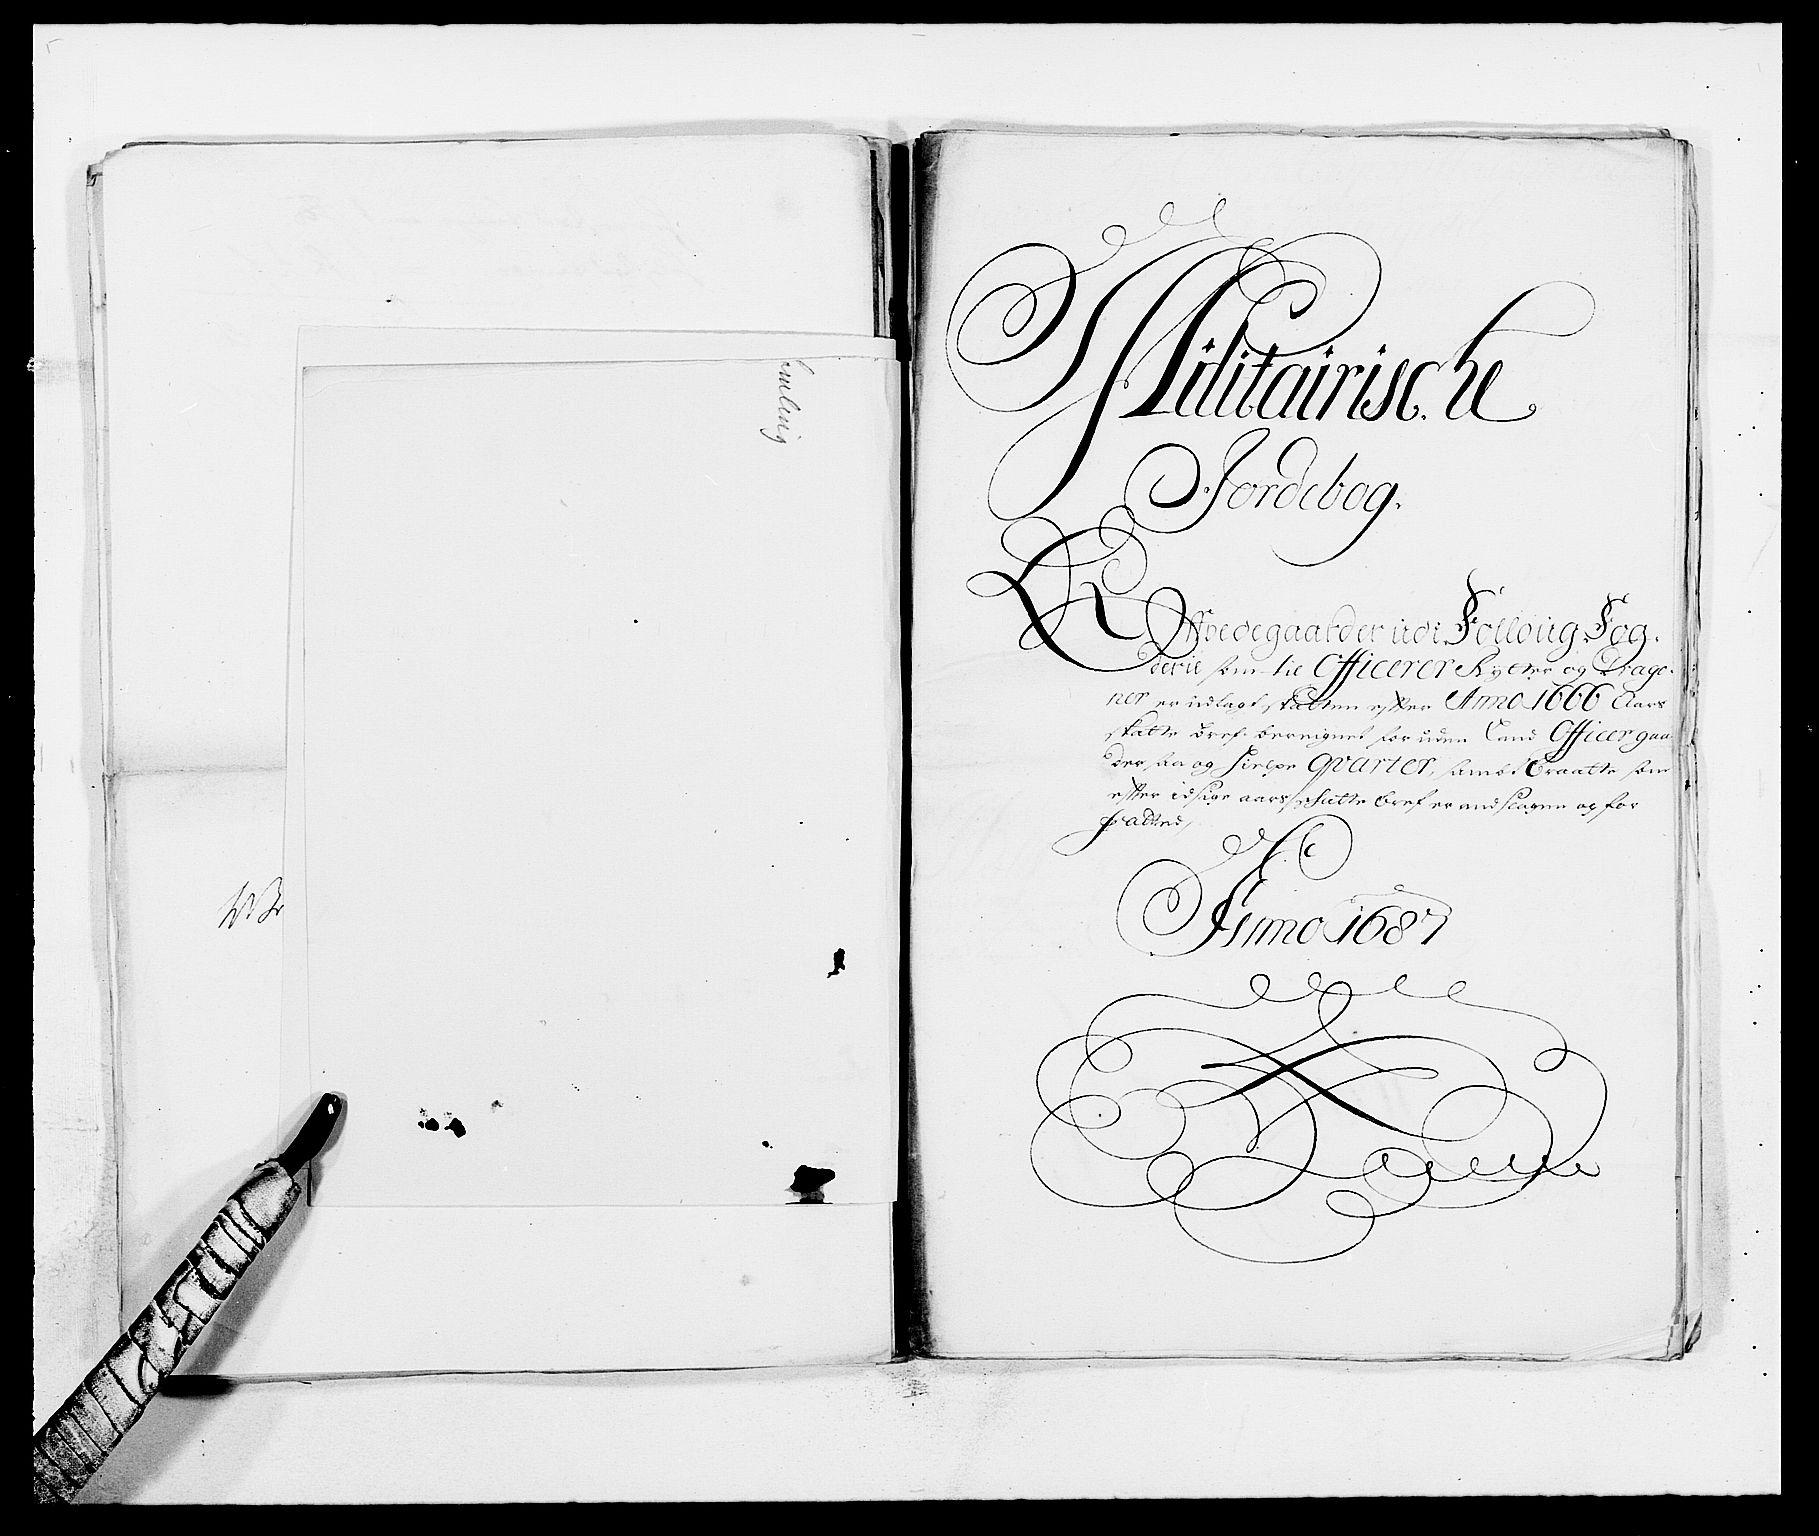 RA, Rentekammeret inntil 1814, Reviderte regnskaper, Fogderegnskap, R09/L0436: Fogderegnskap Follo, 1685-1691, s. 113